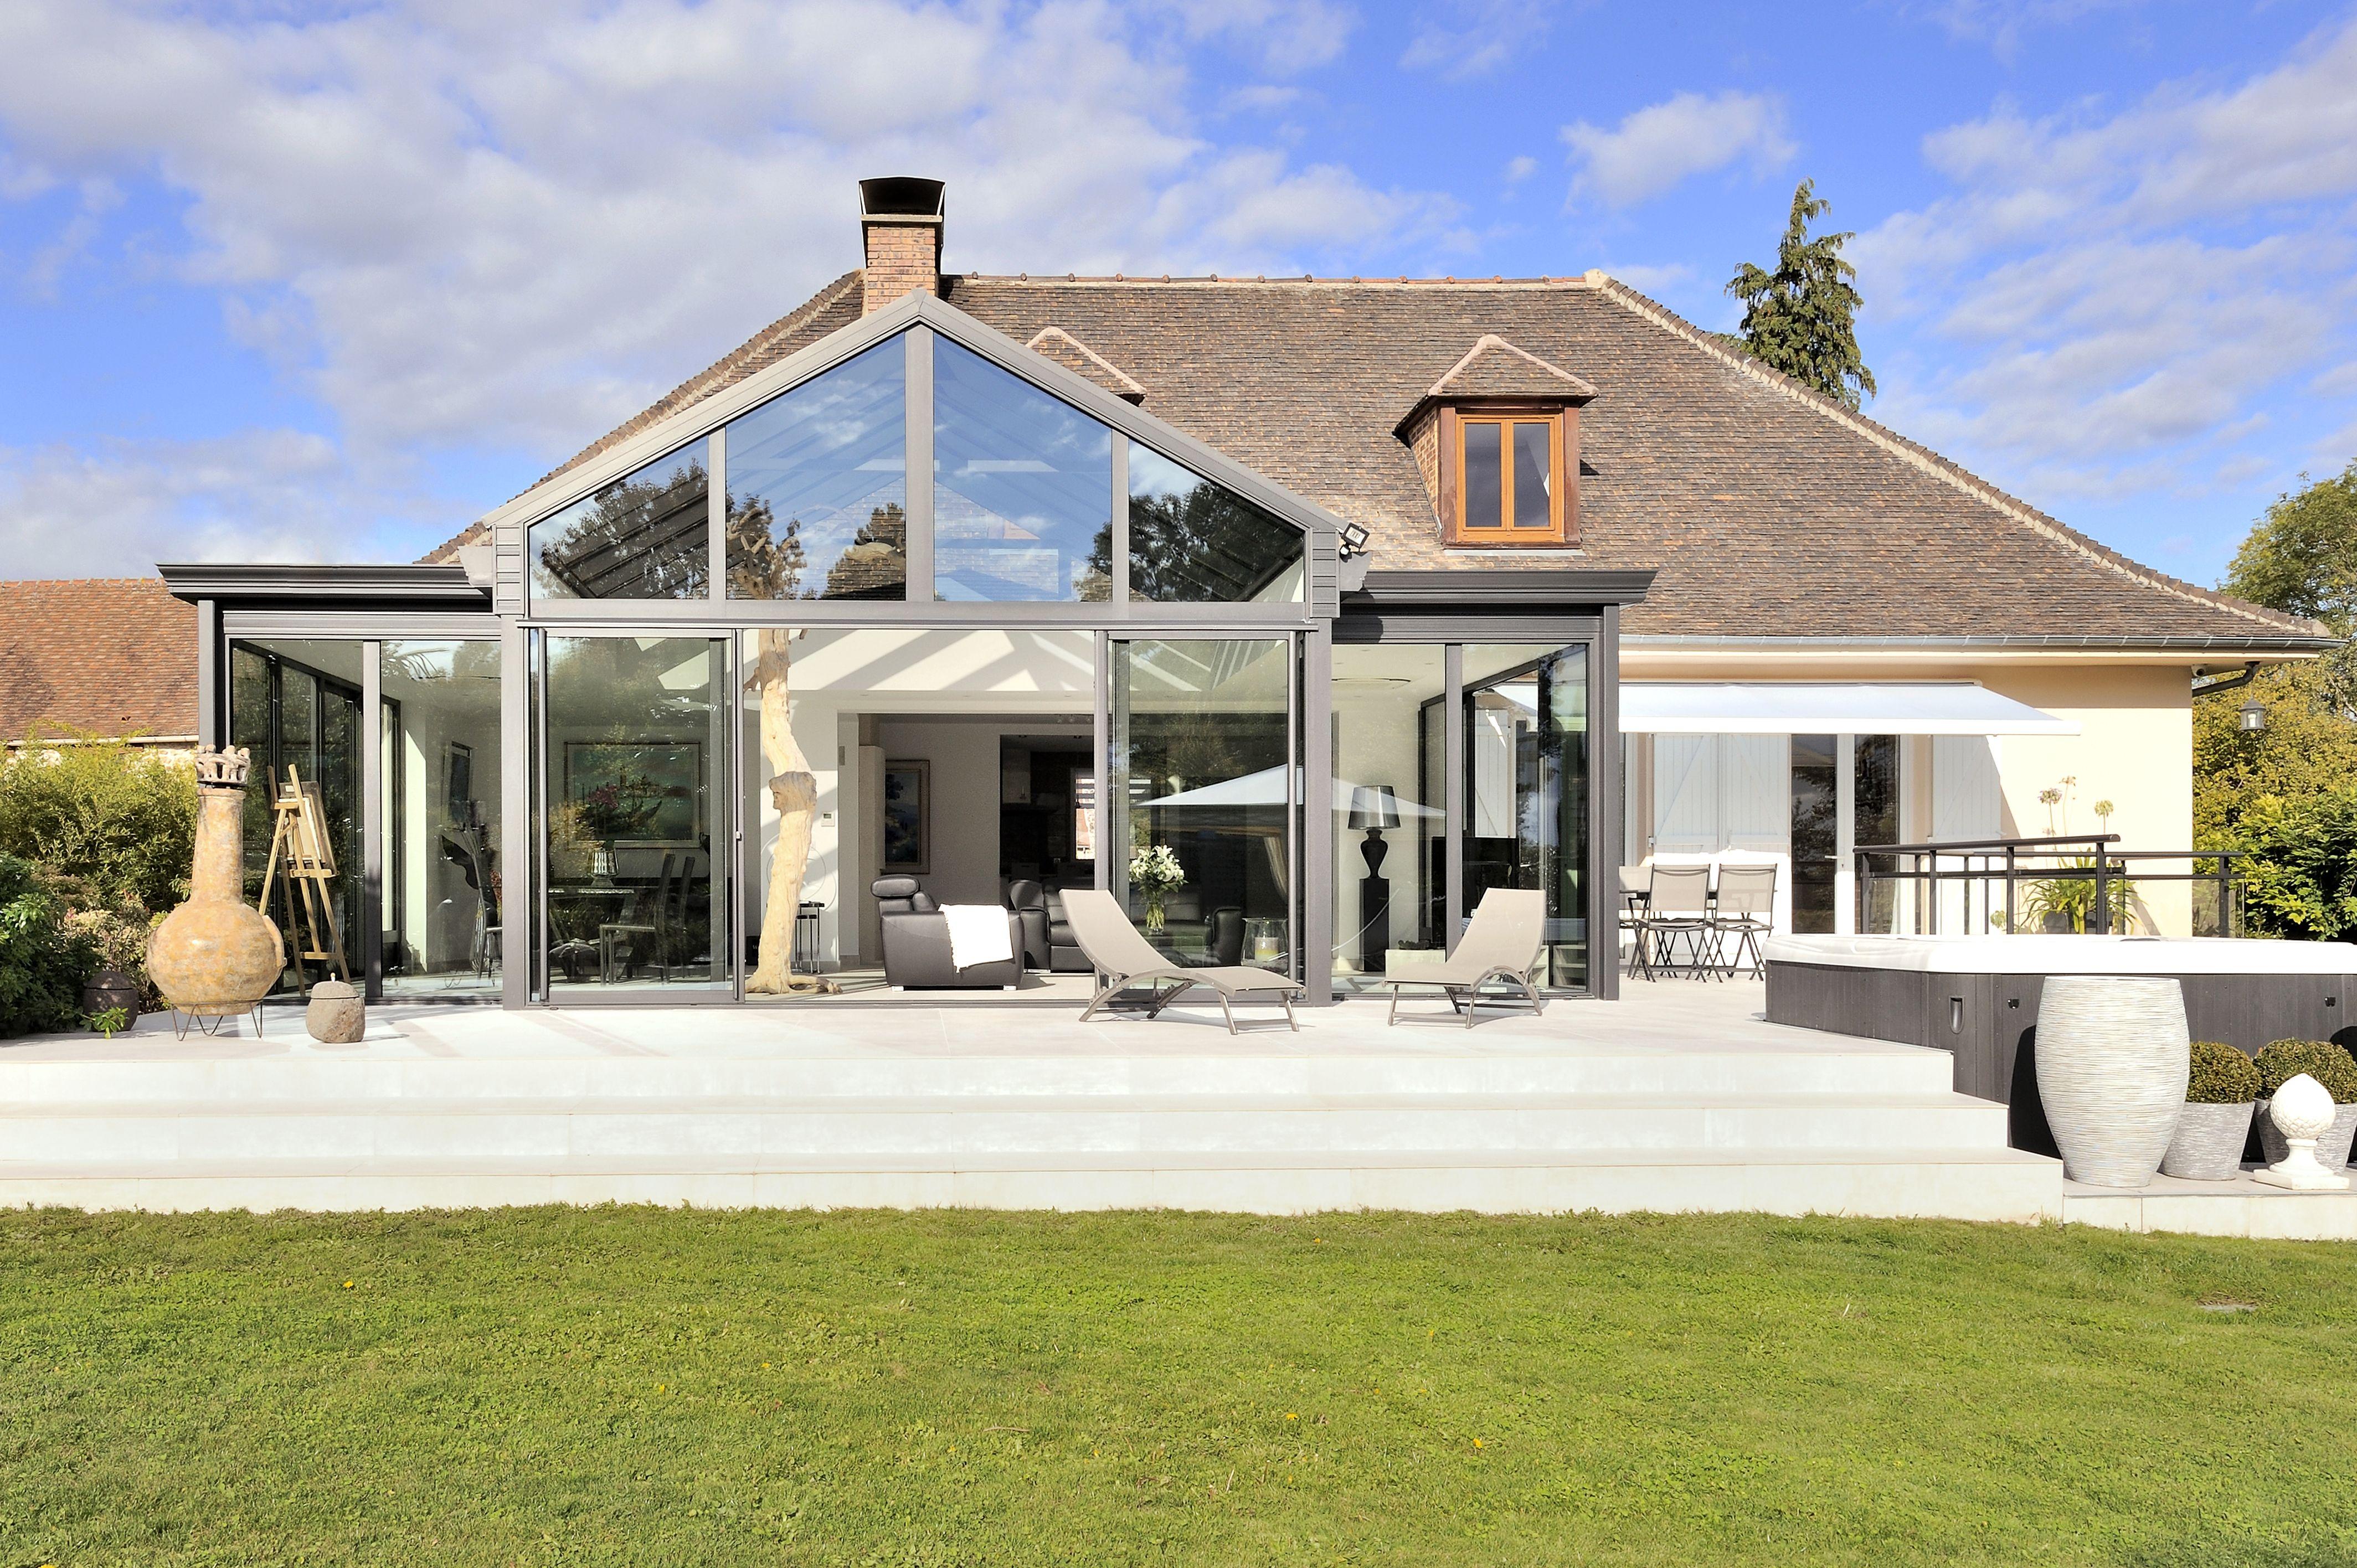 Veranda Terrasse Sur Mesure Du Fabricant Verand Art Veranda Veranda Verandas Abri Piscine Extention Maison Veranda